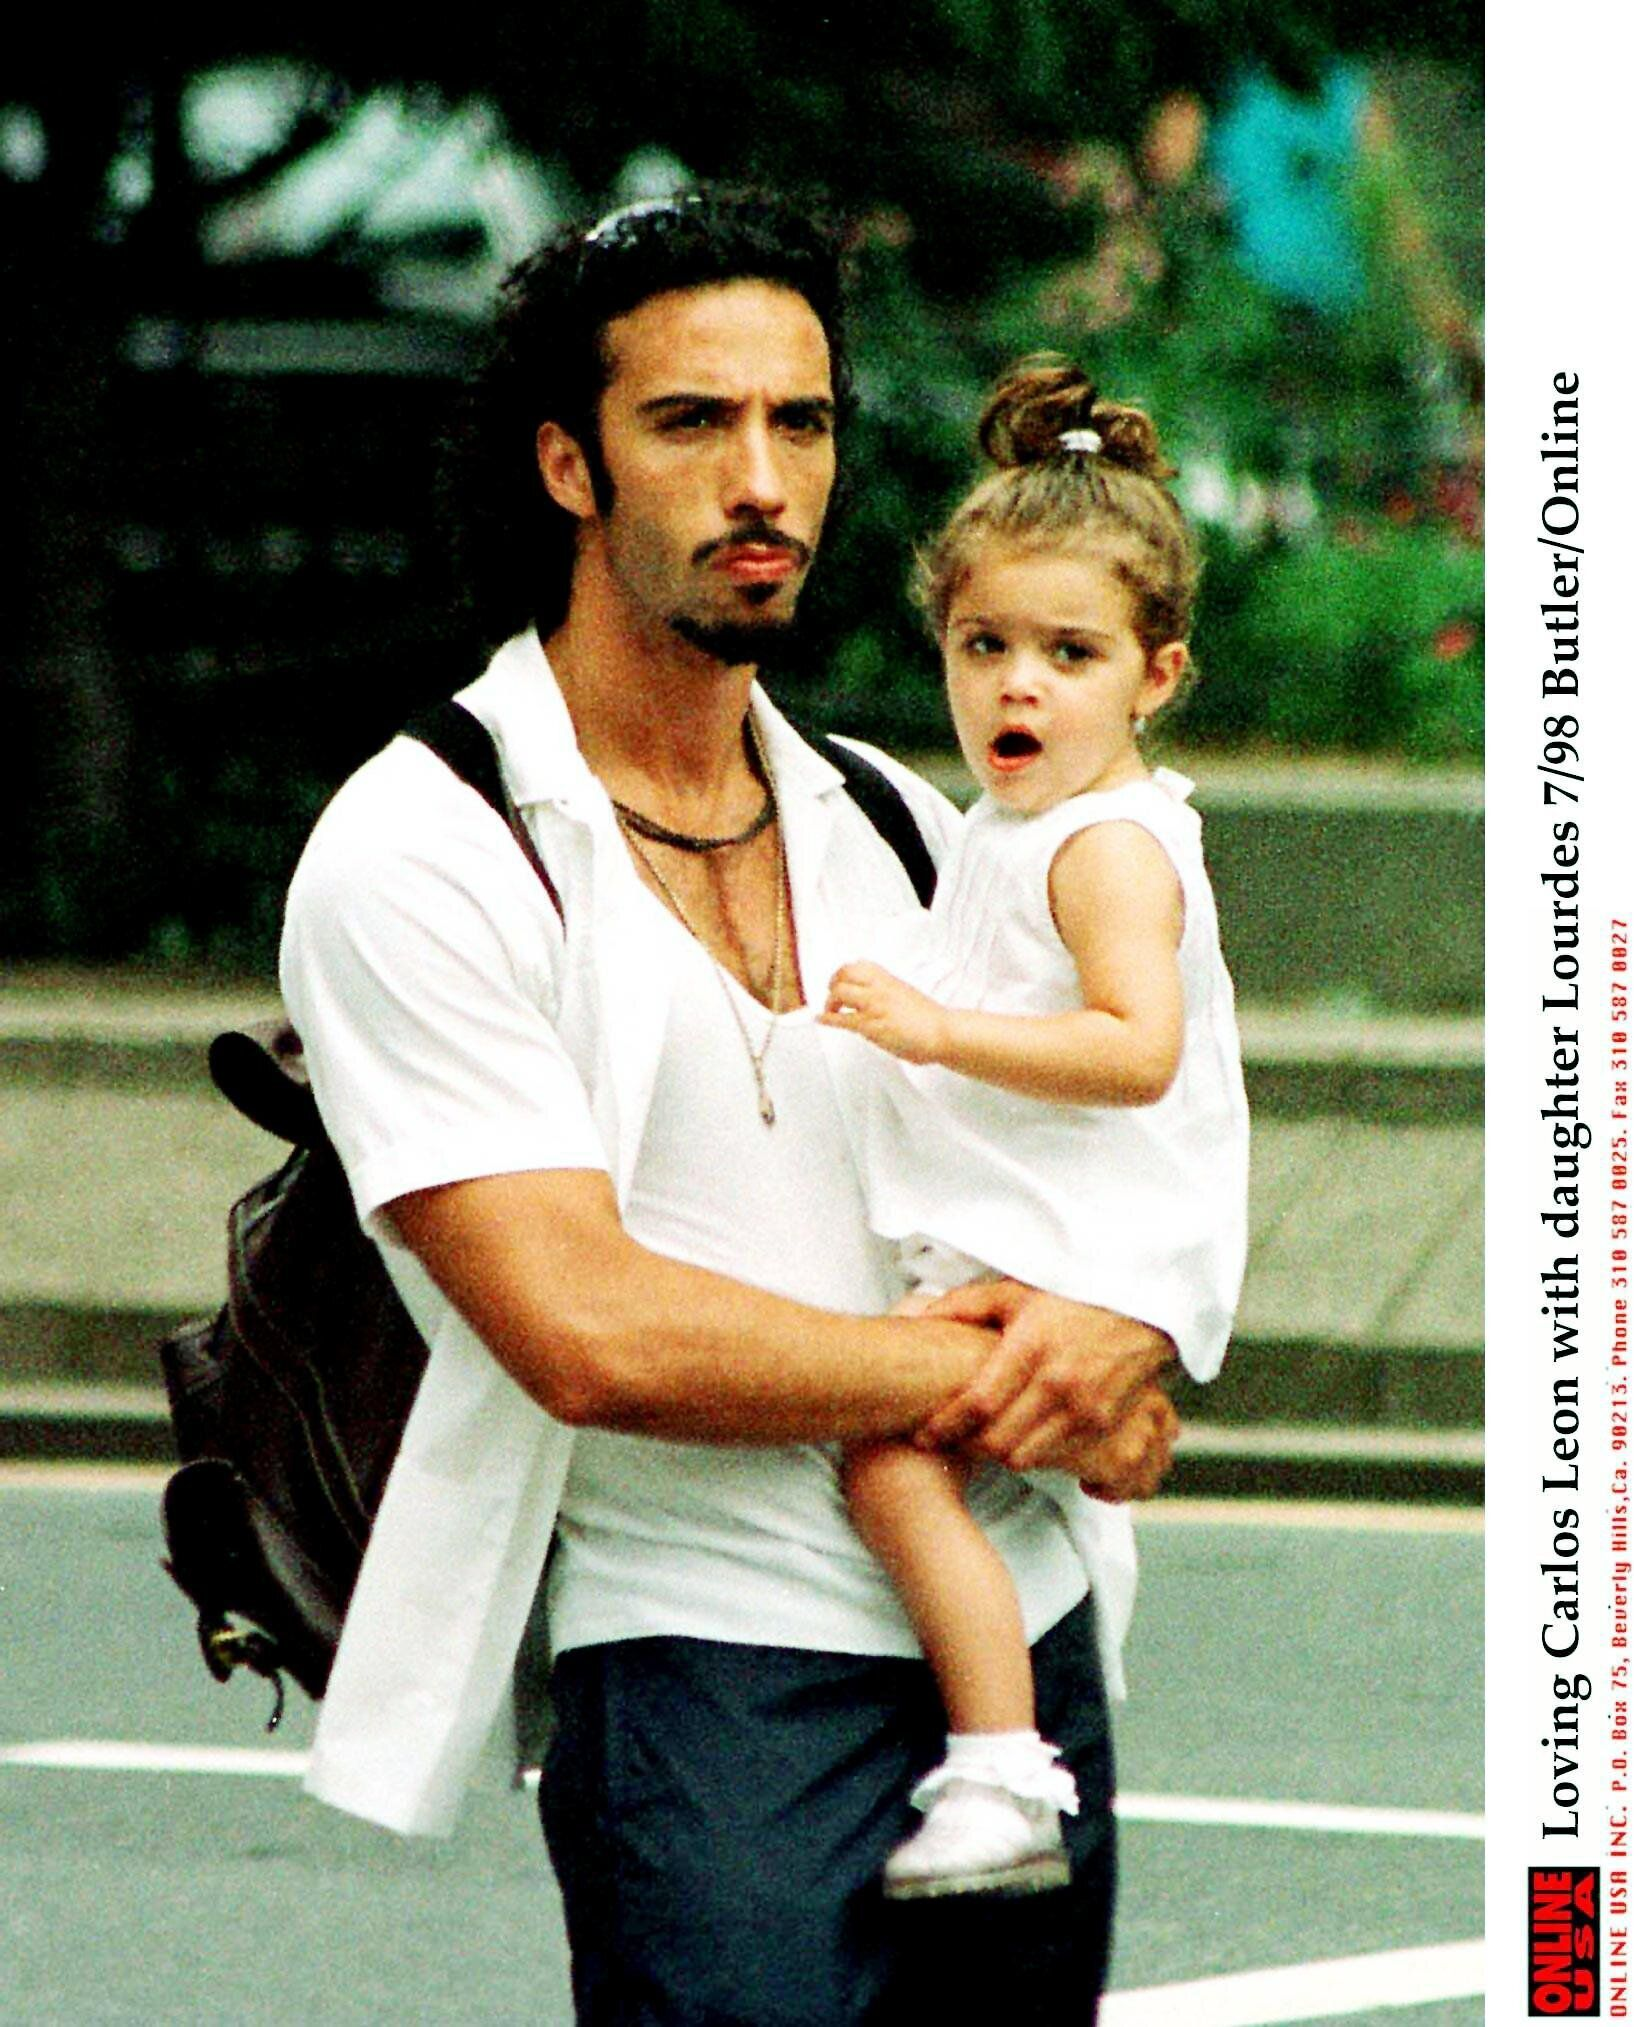 Madonna Daughter Lourdes Father : madonna, daughter, lourdes, father, Madonna's, Daughter, Lourdes, Cuban, Carlos, Through, Years, (PHOTOS), HuffPost